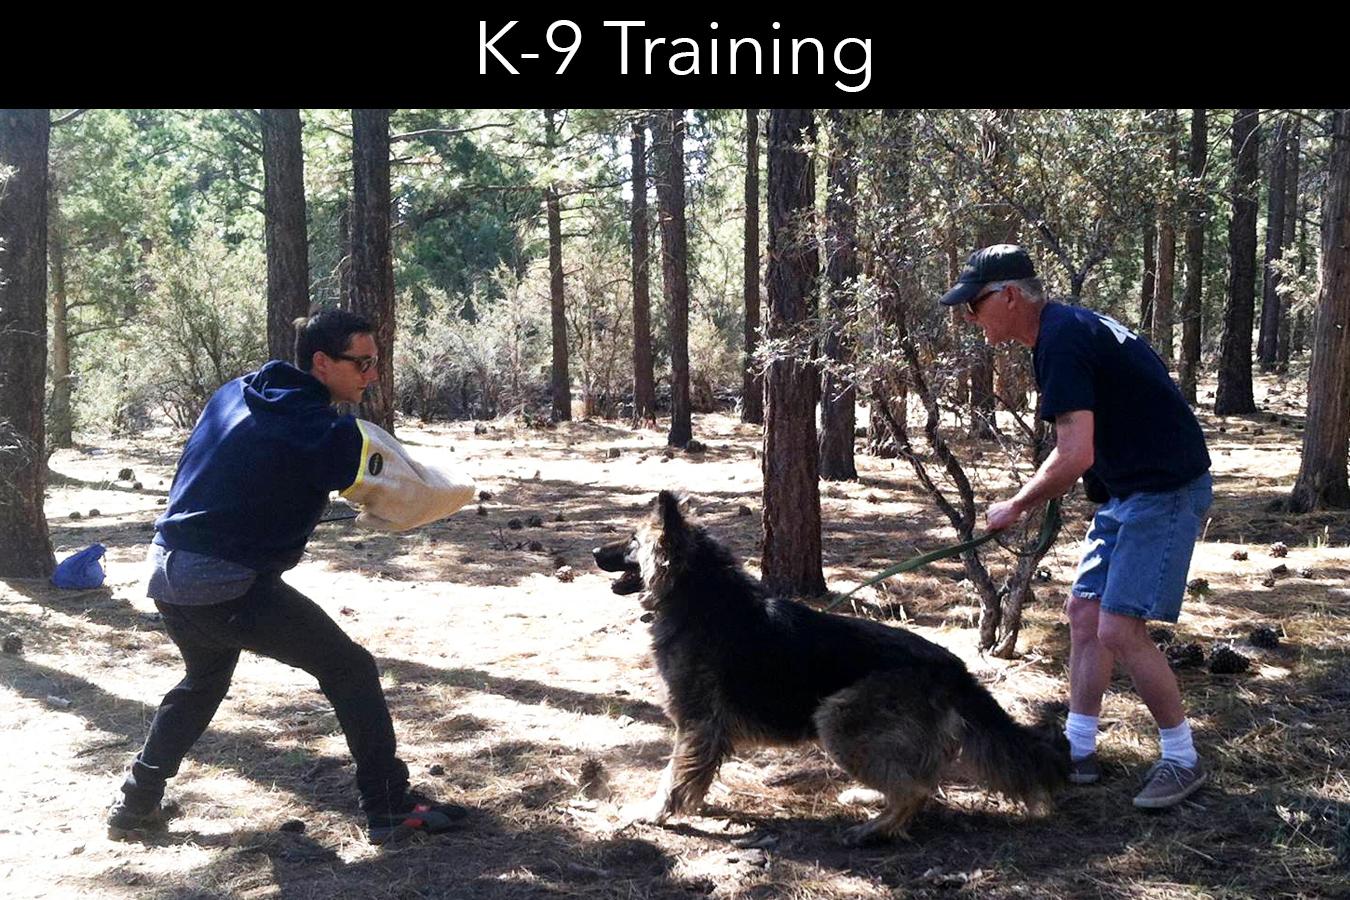 Big Bear Canine School K-9